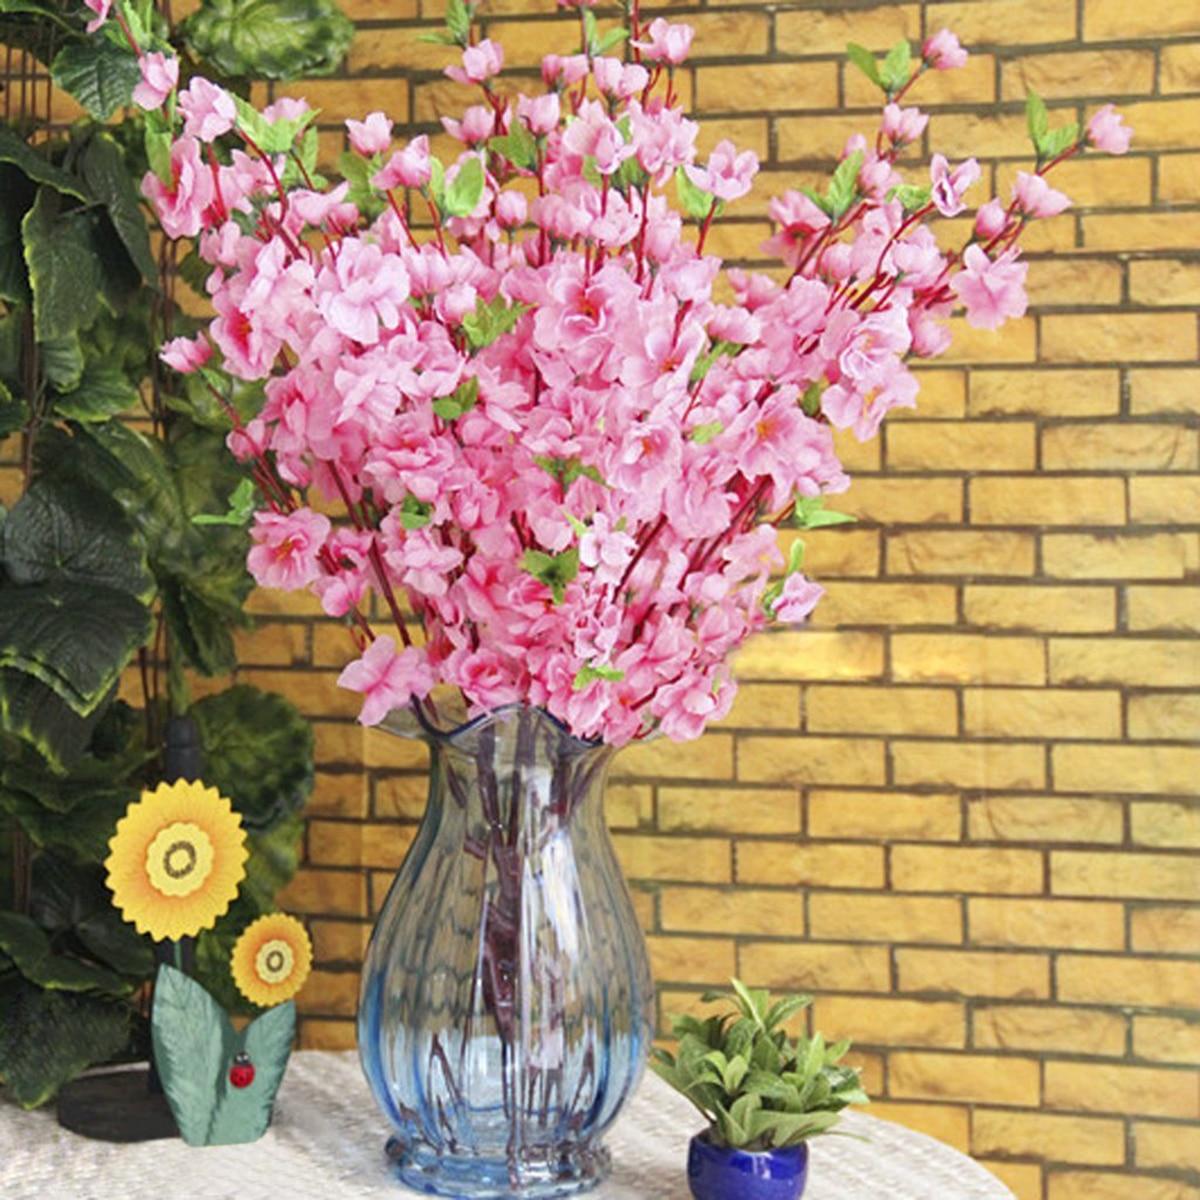 6st persika blomma simulering blommor konstgjorda blommor siden - Semester och fester - Foto 5